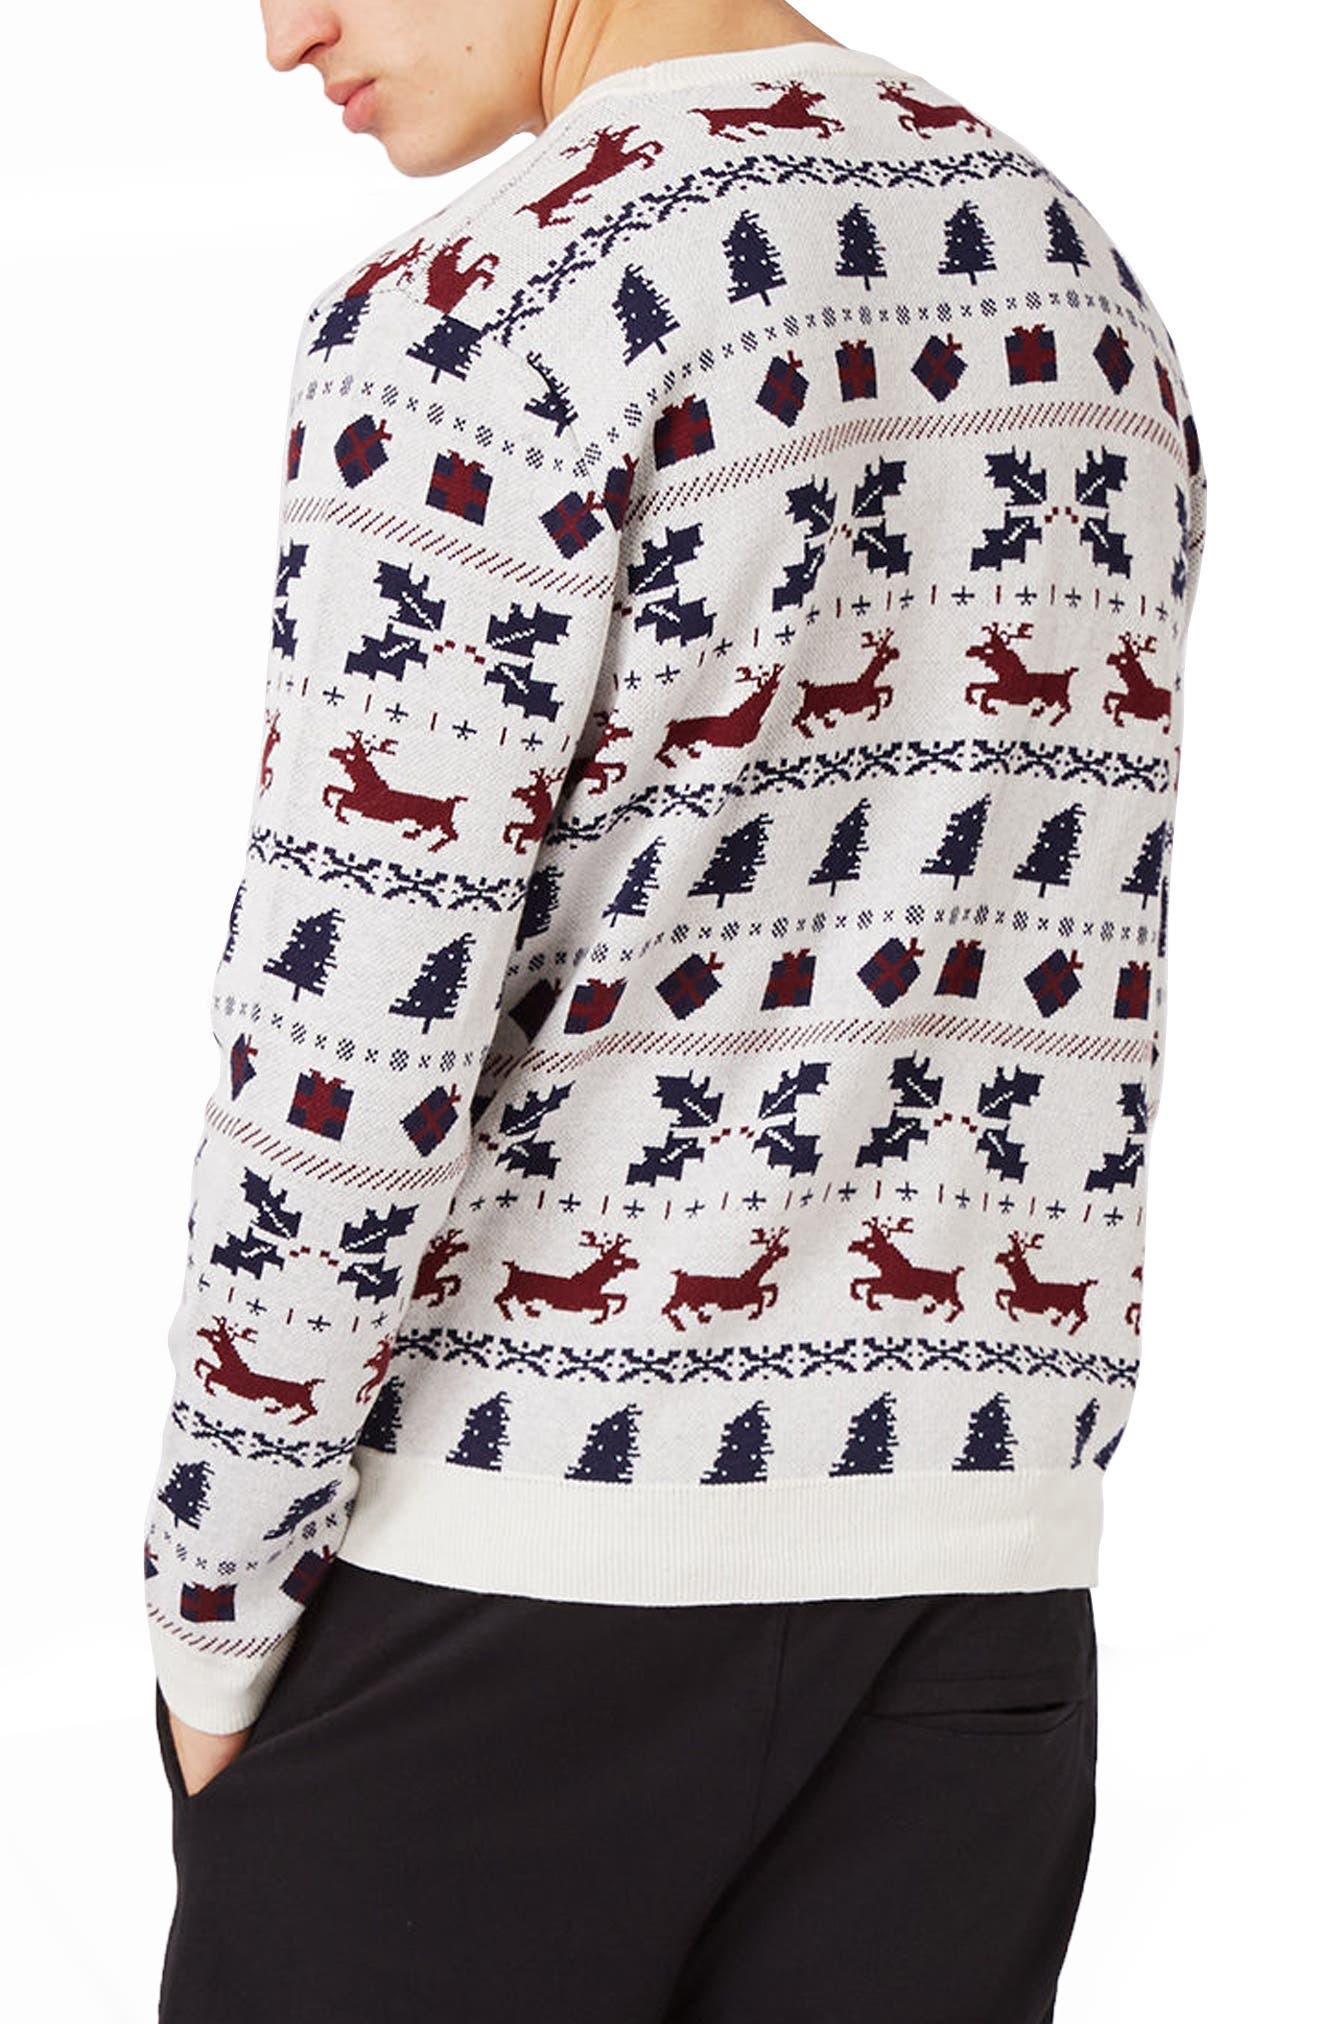 TOPMAN,                             Christmas Fair Isle Sweater,                             Alternate thumbnail 2, color,                             901